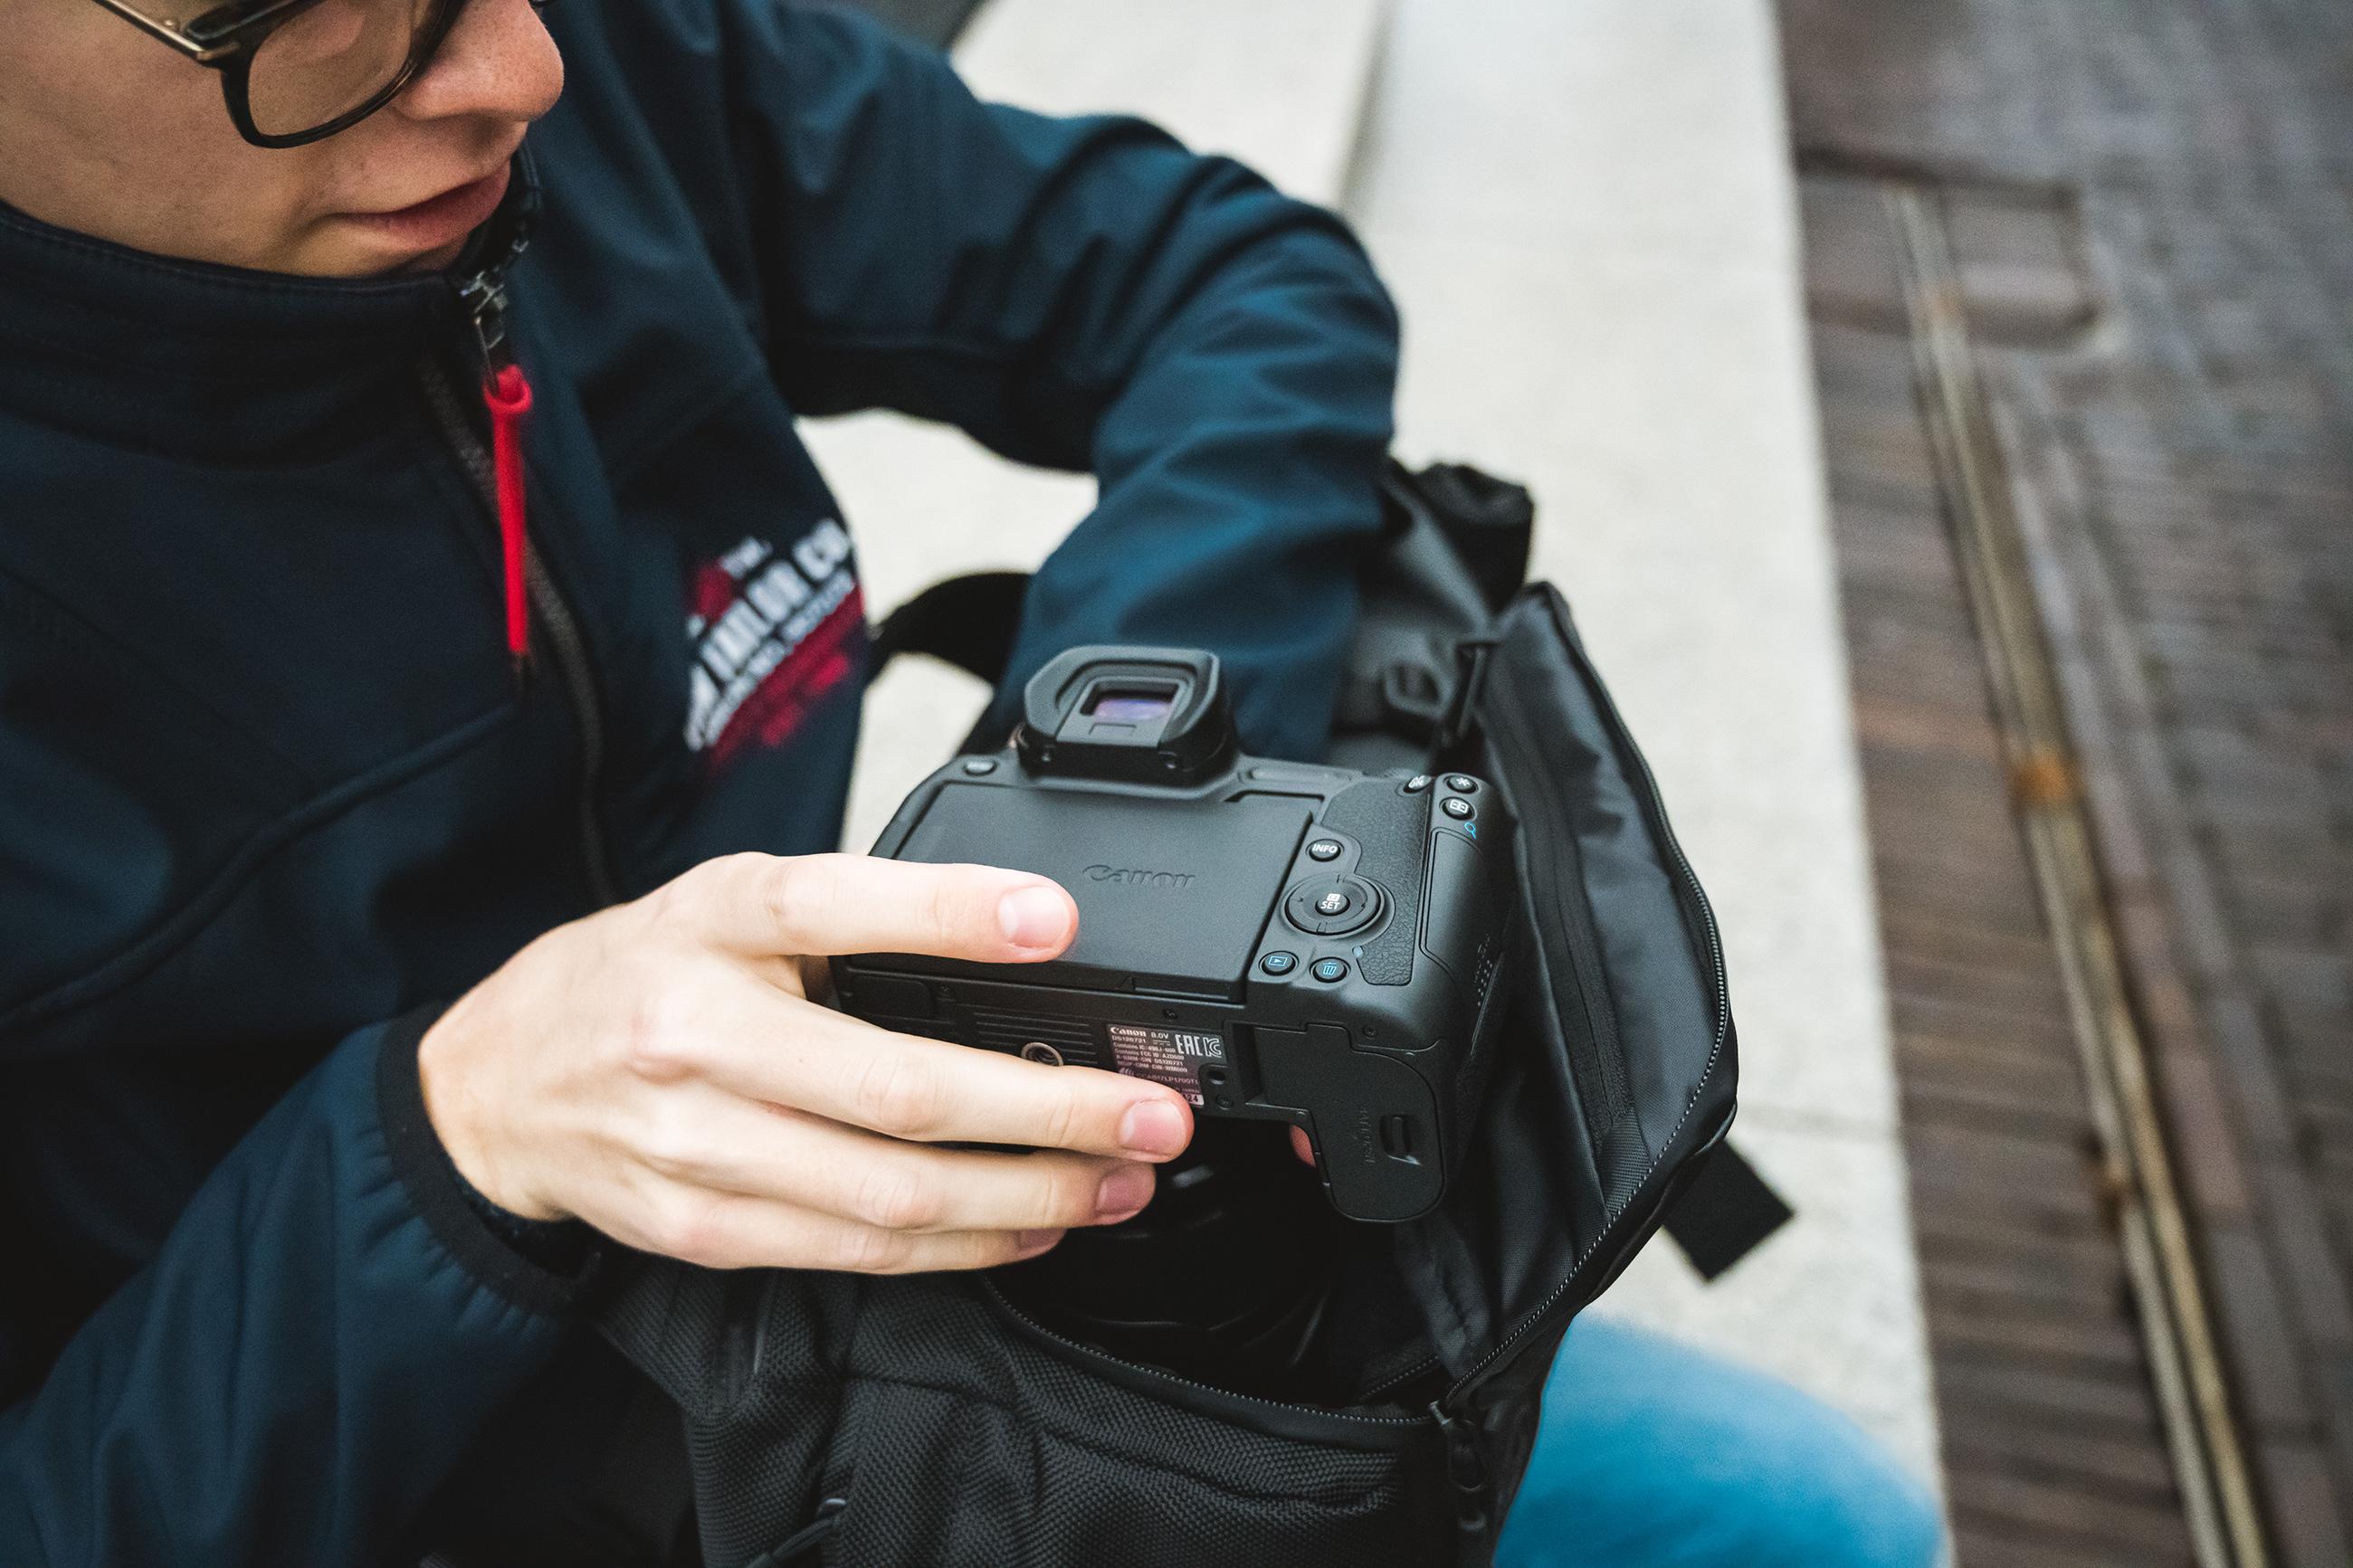 Fotorucksack WANDRD PRVKE 2018